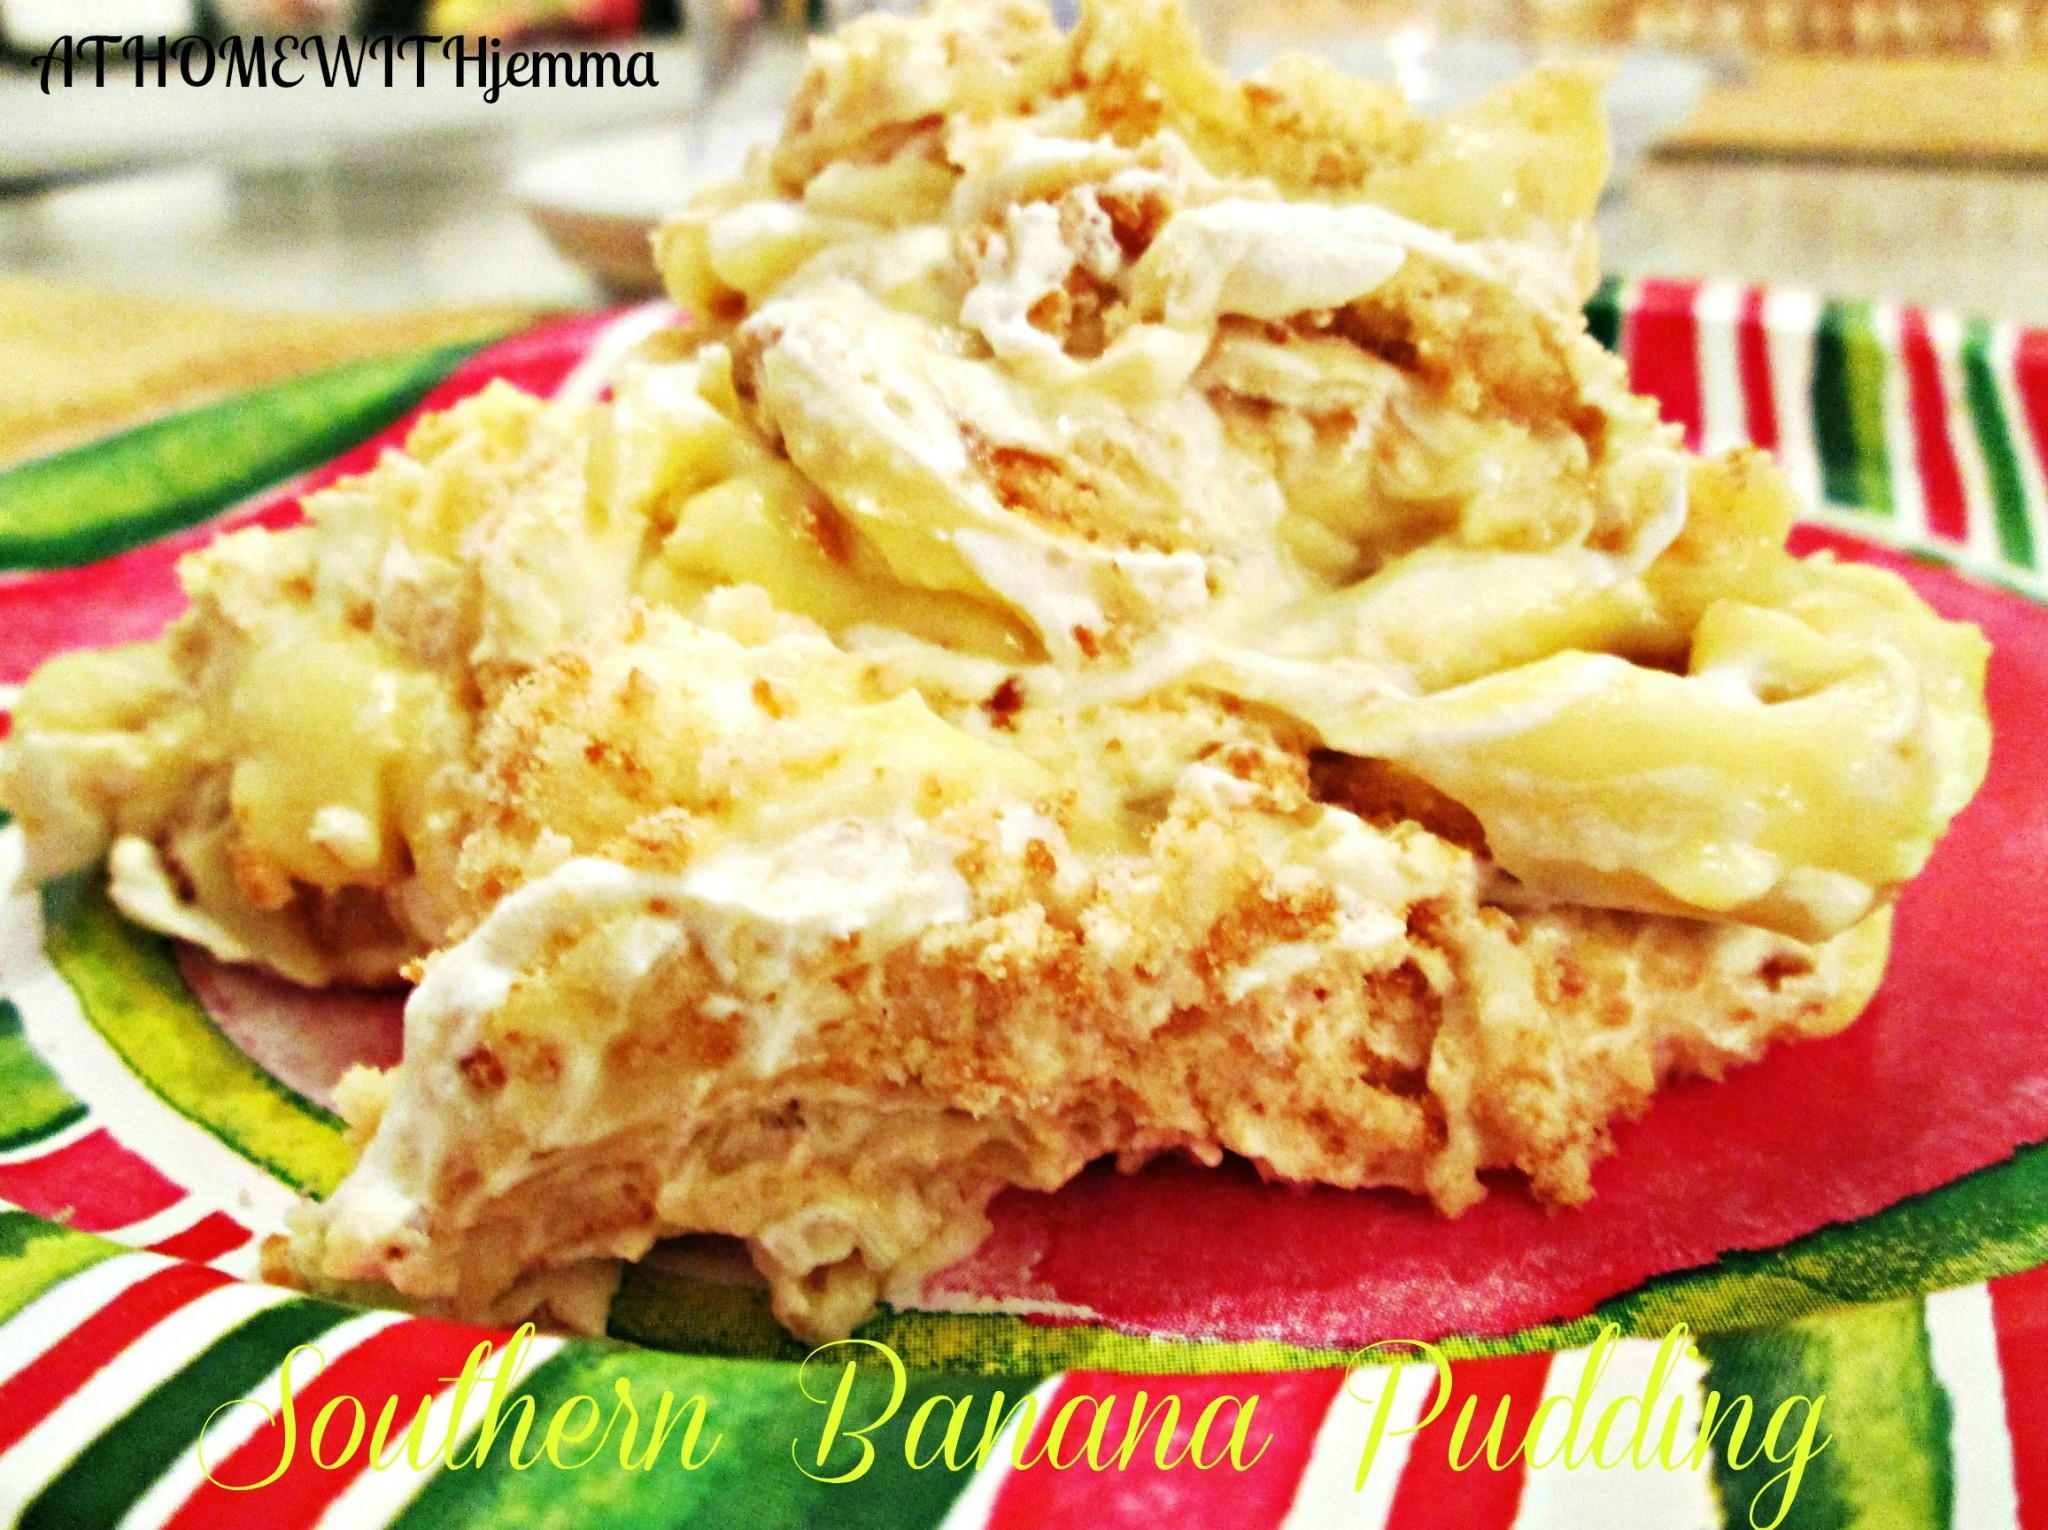 recipe-dessert-banana-pudding-athomewithjemma